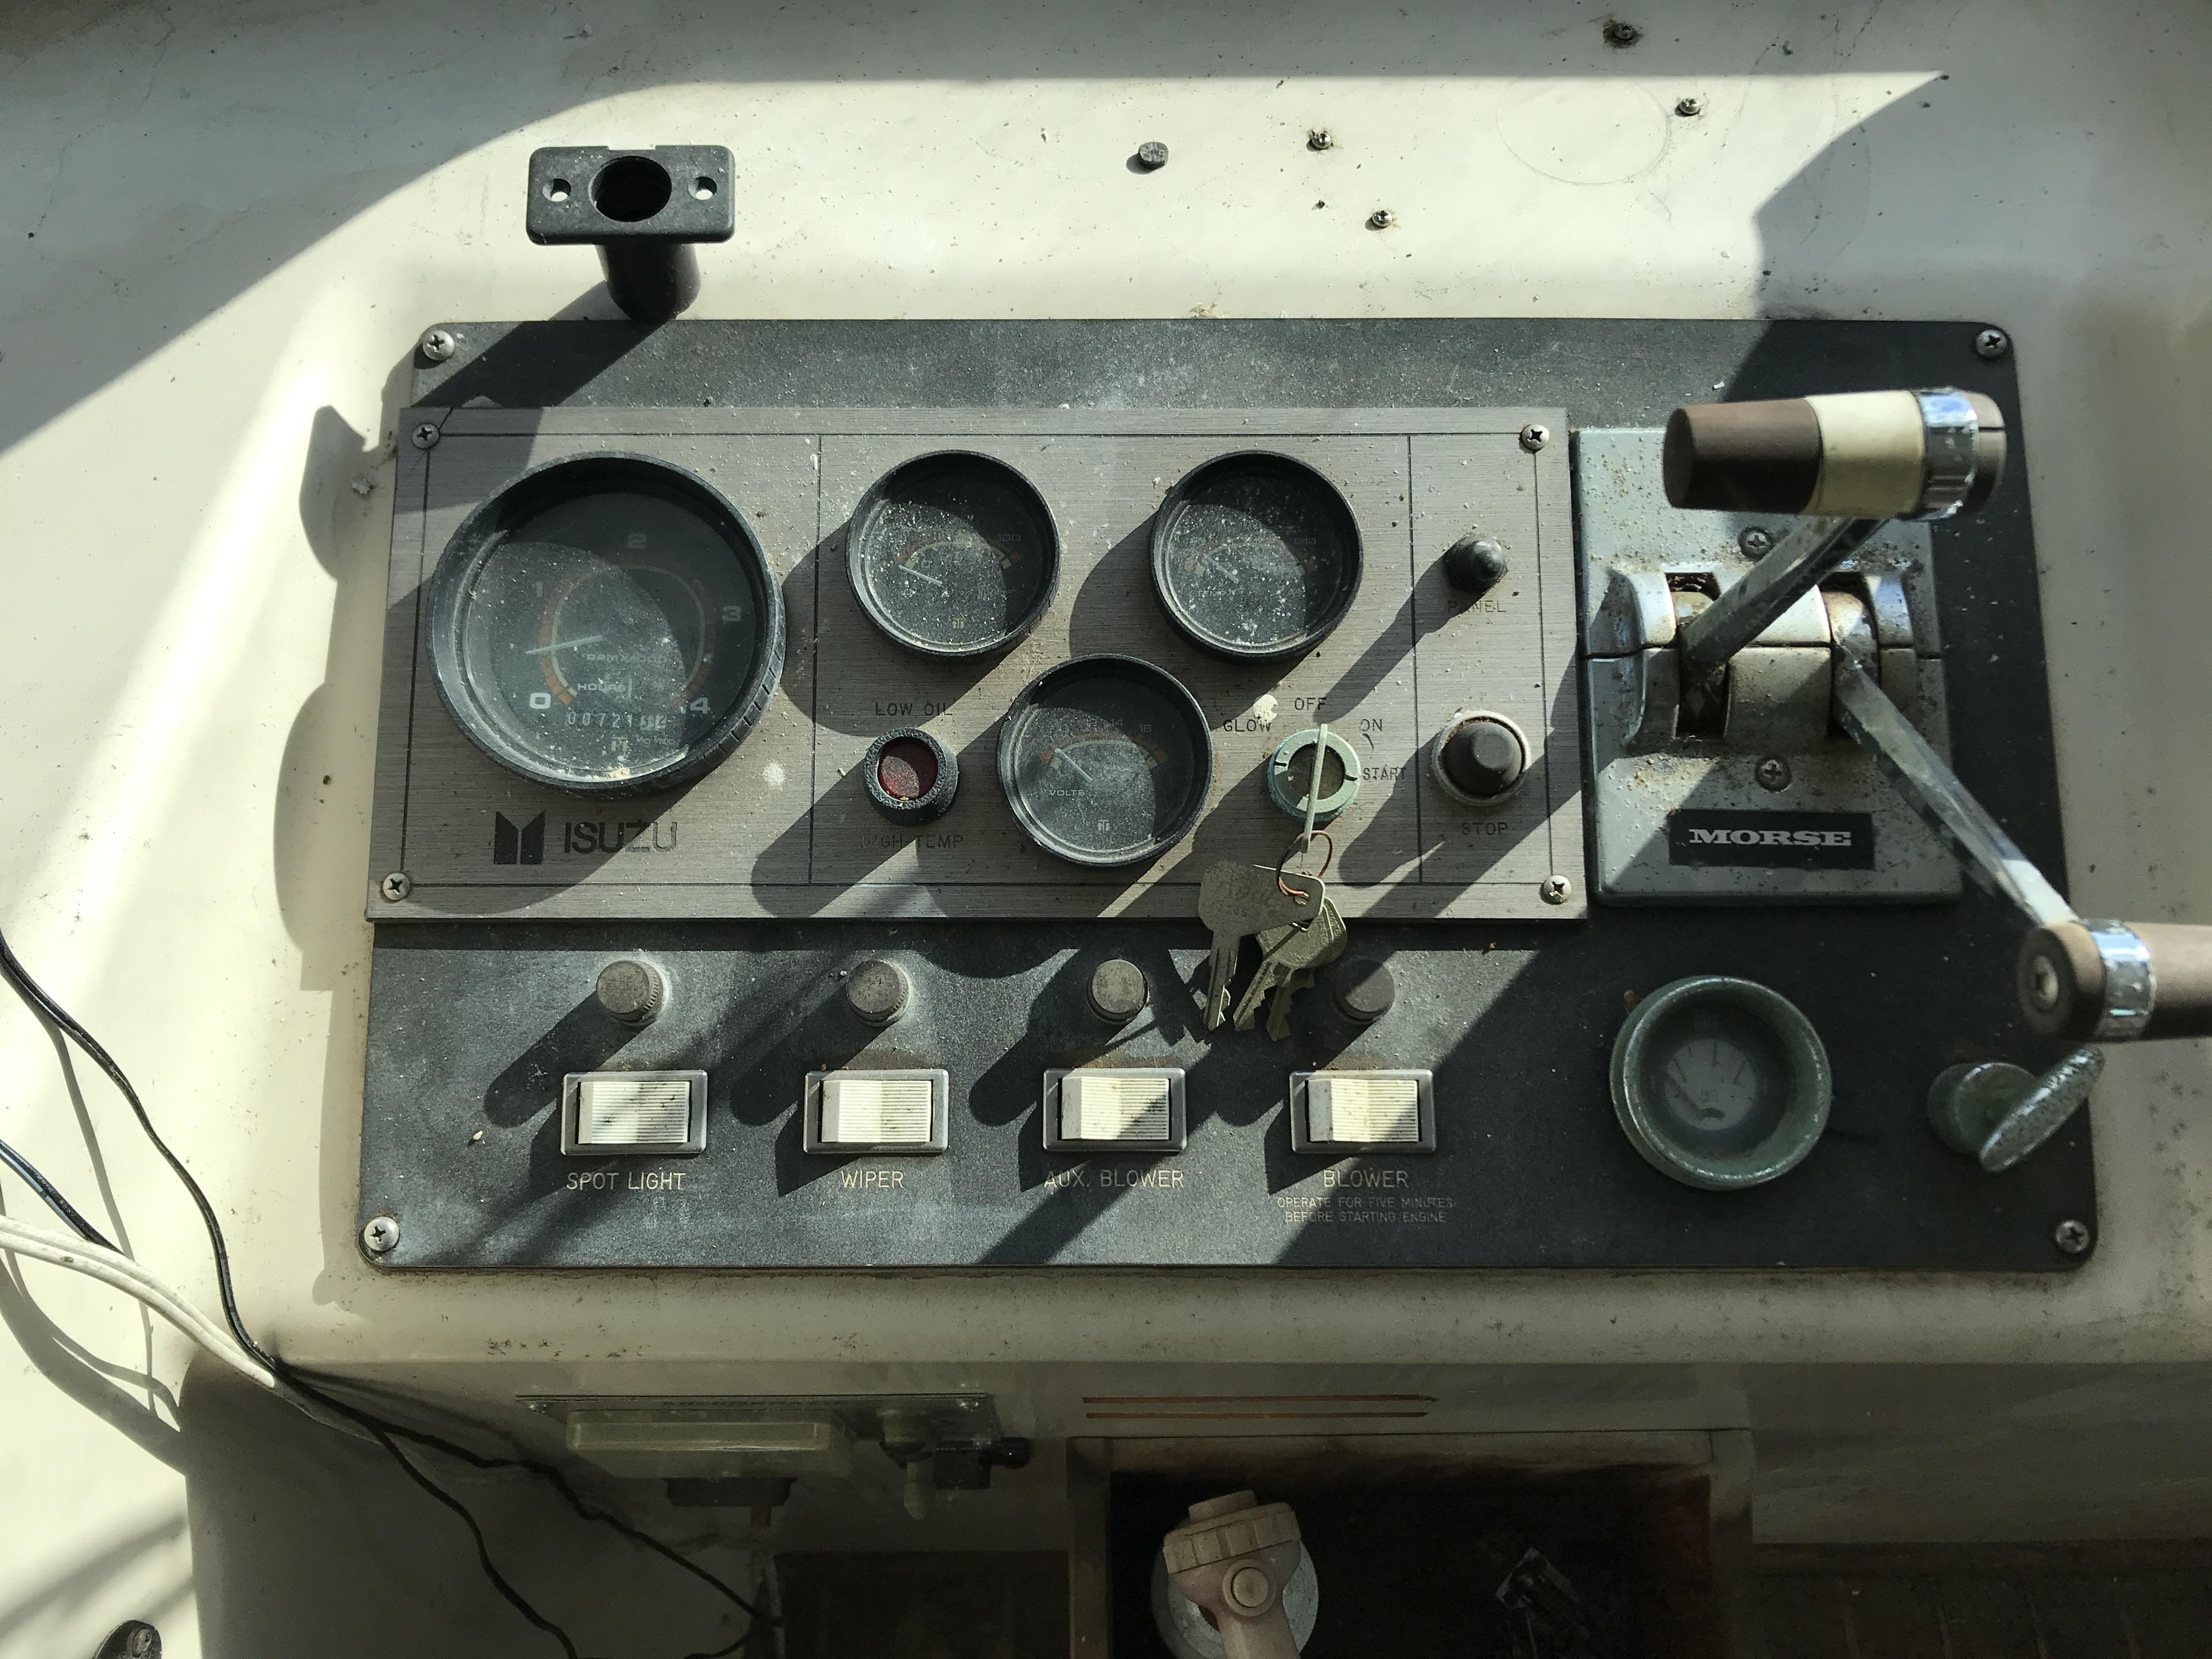 Carri-craft 57-ft Power Catamaran - starboard engine controls